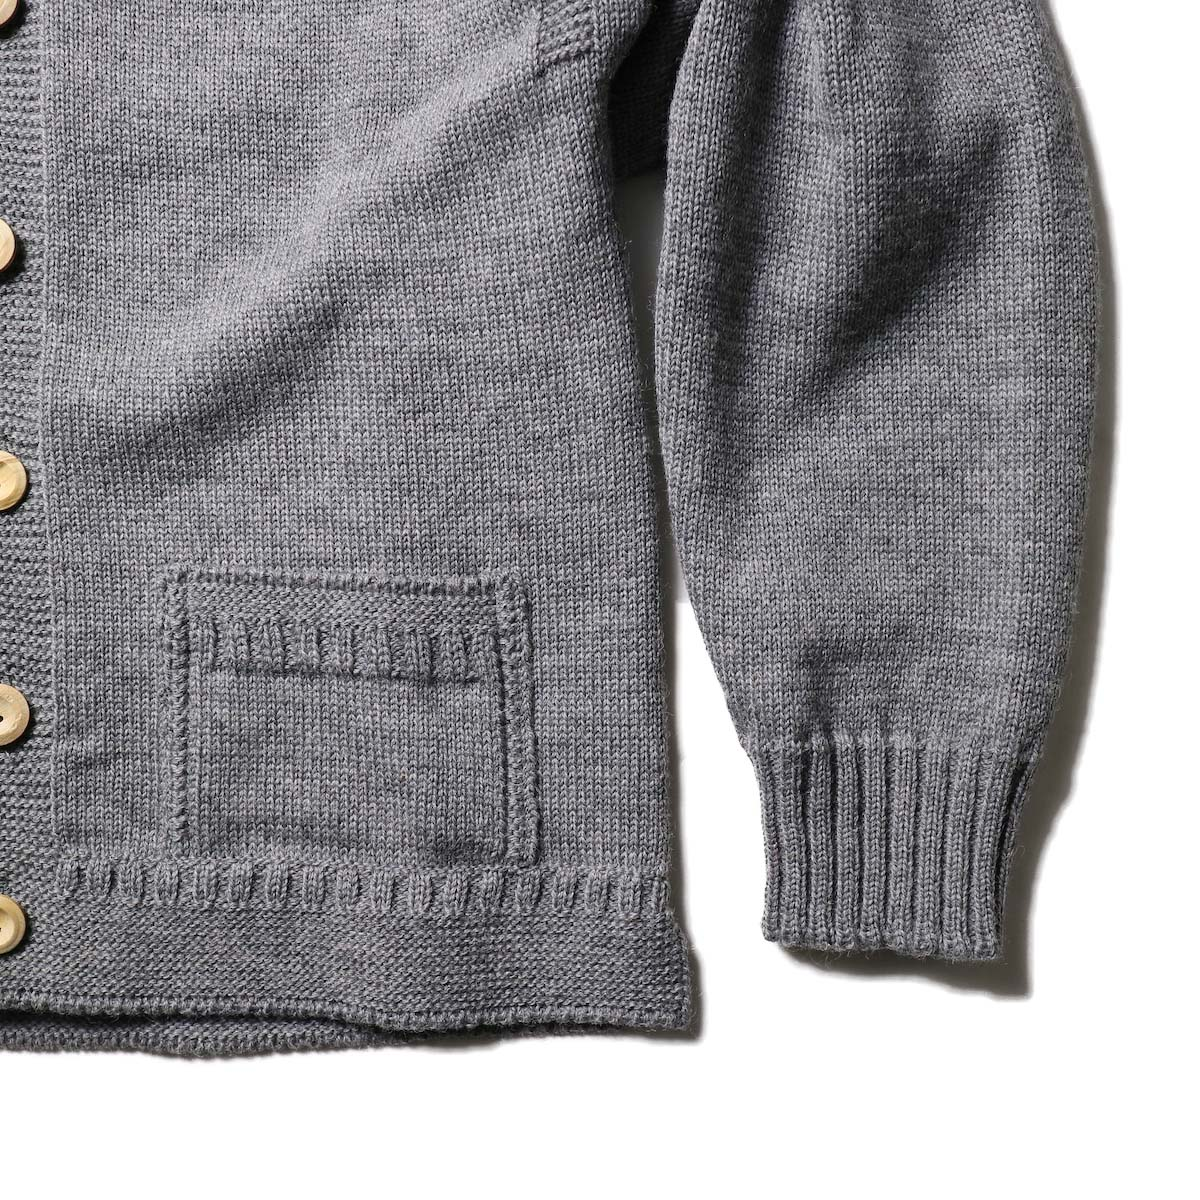 Guernsey Woollens / Bouet (Md Grey)袖、裾